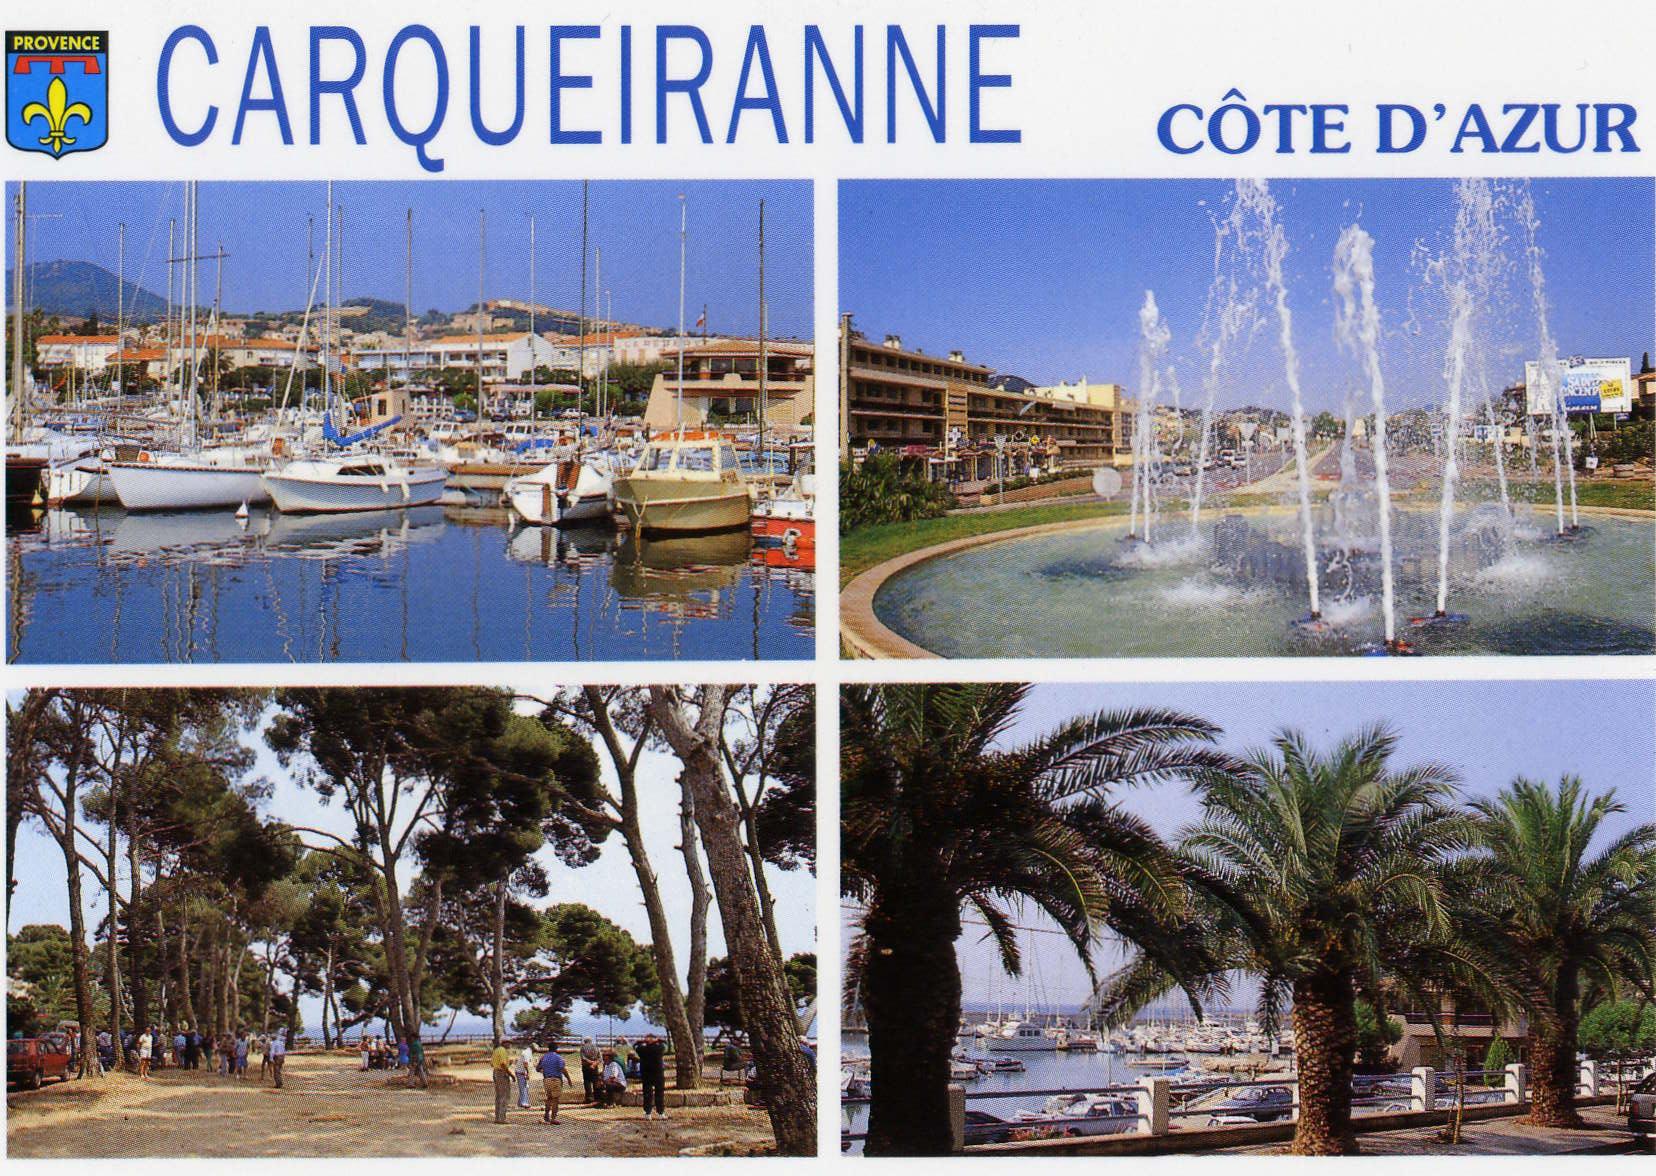 Pr sentation de 2 villes en bord de mer carqueiranne iles de porquerolles blog mer - Coiffeur du port carqueiranne ...